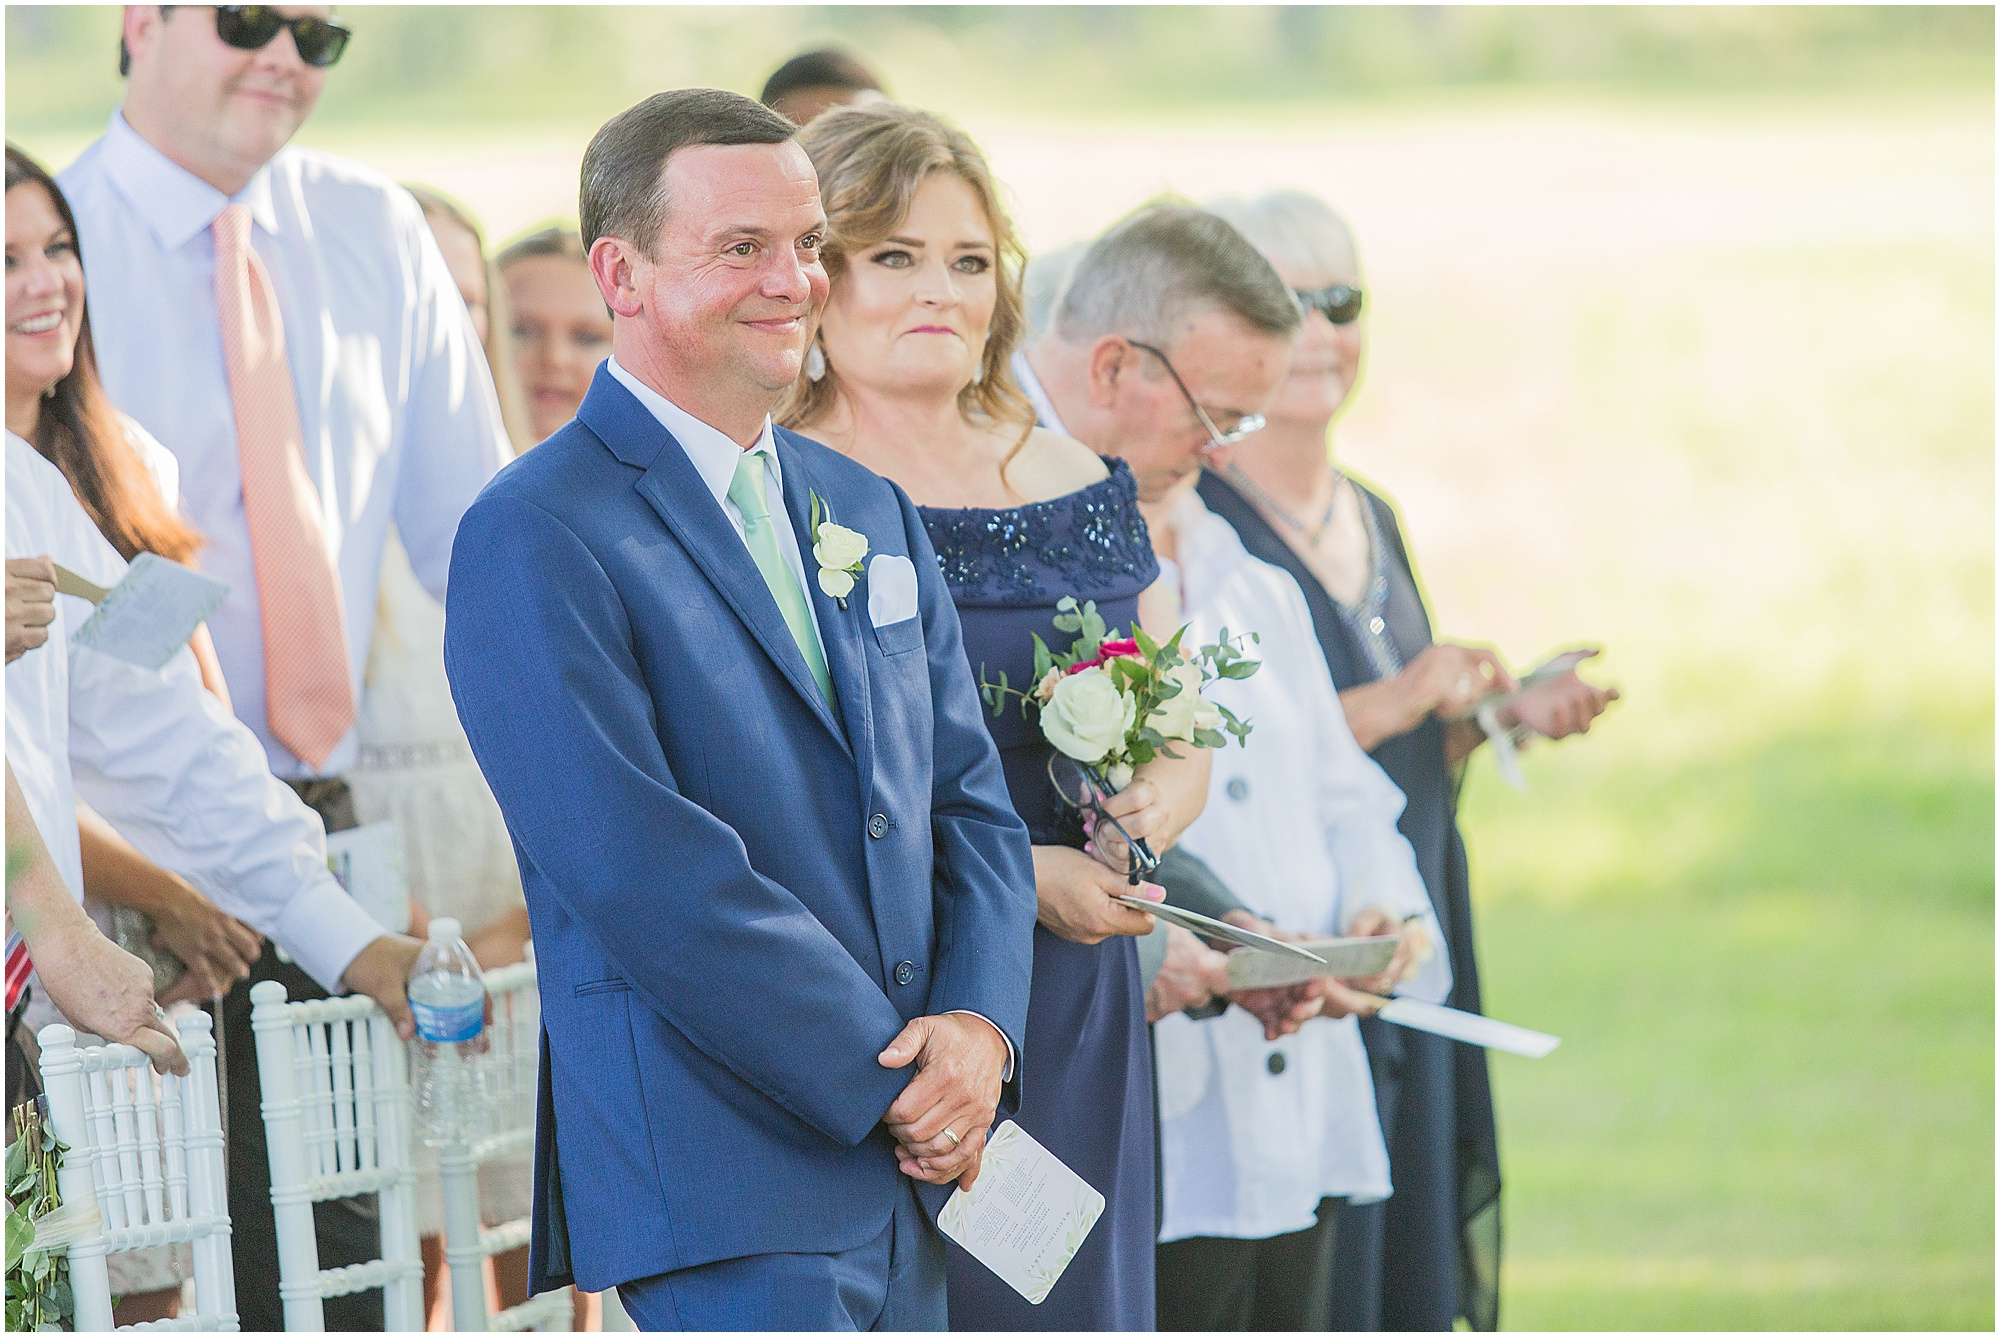 starkville-mississippi-wedding-page-place-dodson-farms_0065.jpg